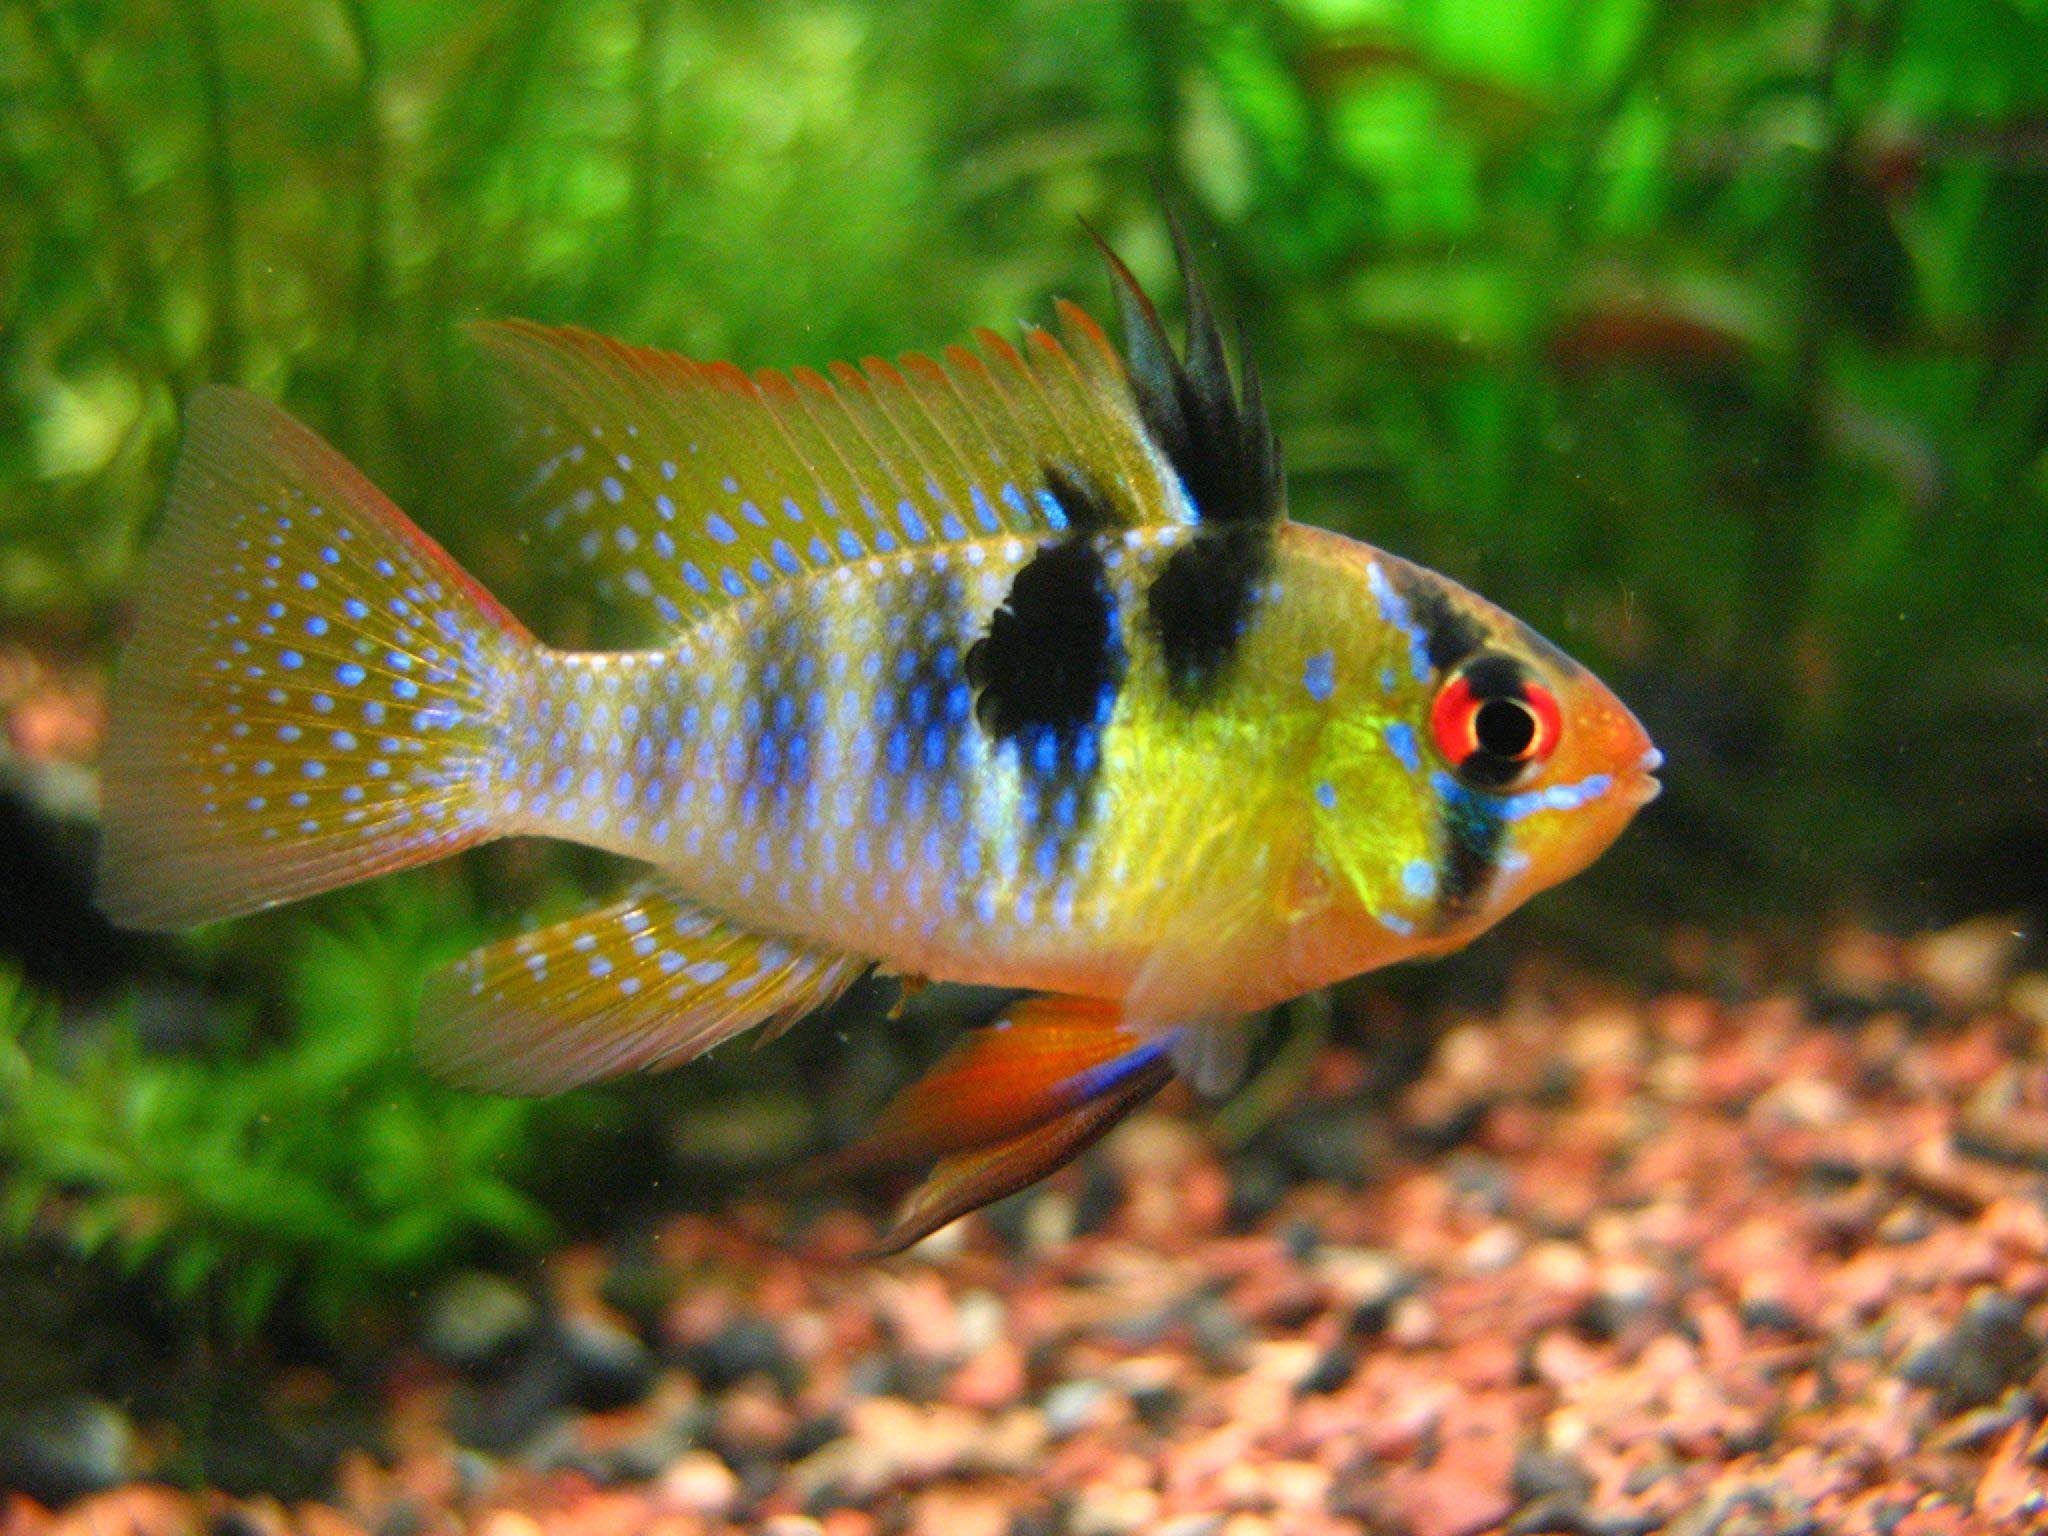 Tropical Aquarium Community Fish Tropical Fish Tanks Tropical Freshwater Fish Aquarium Fish